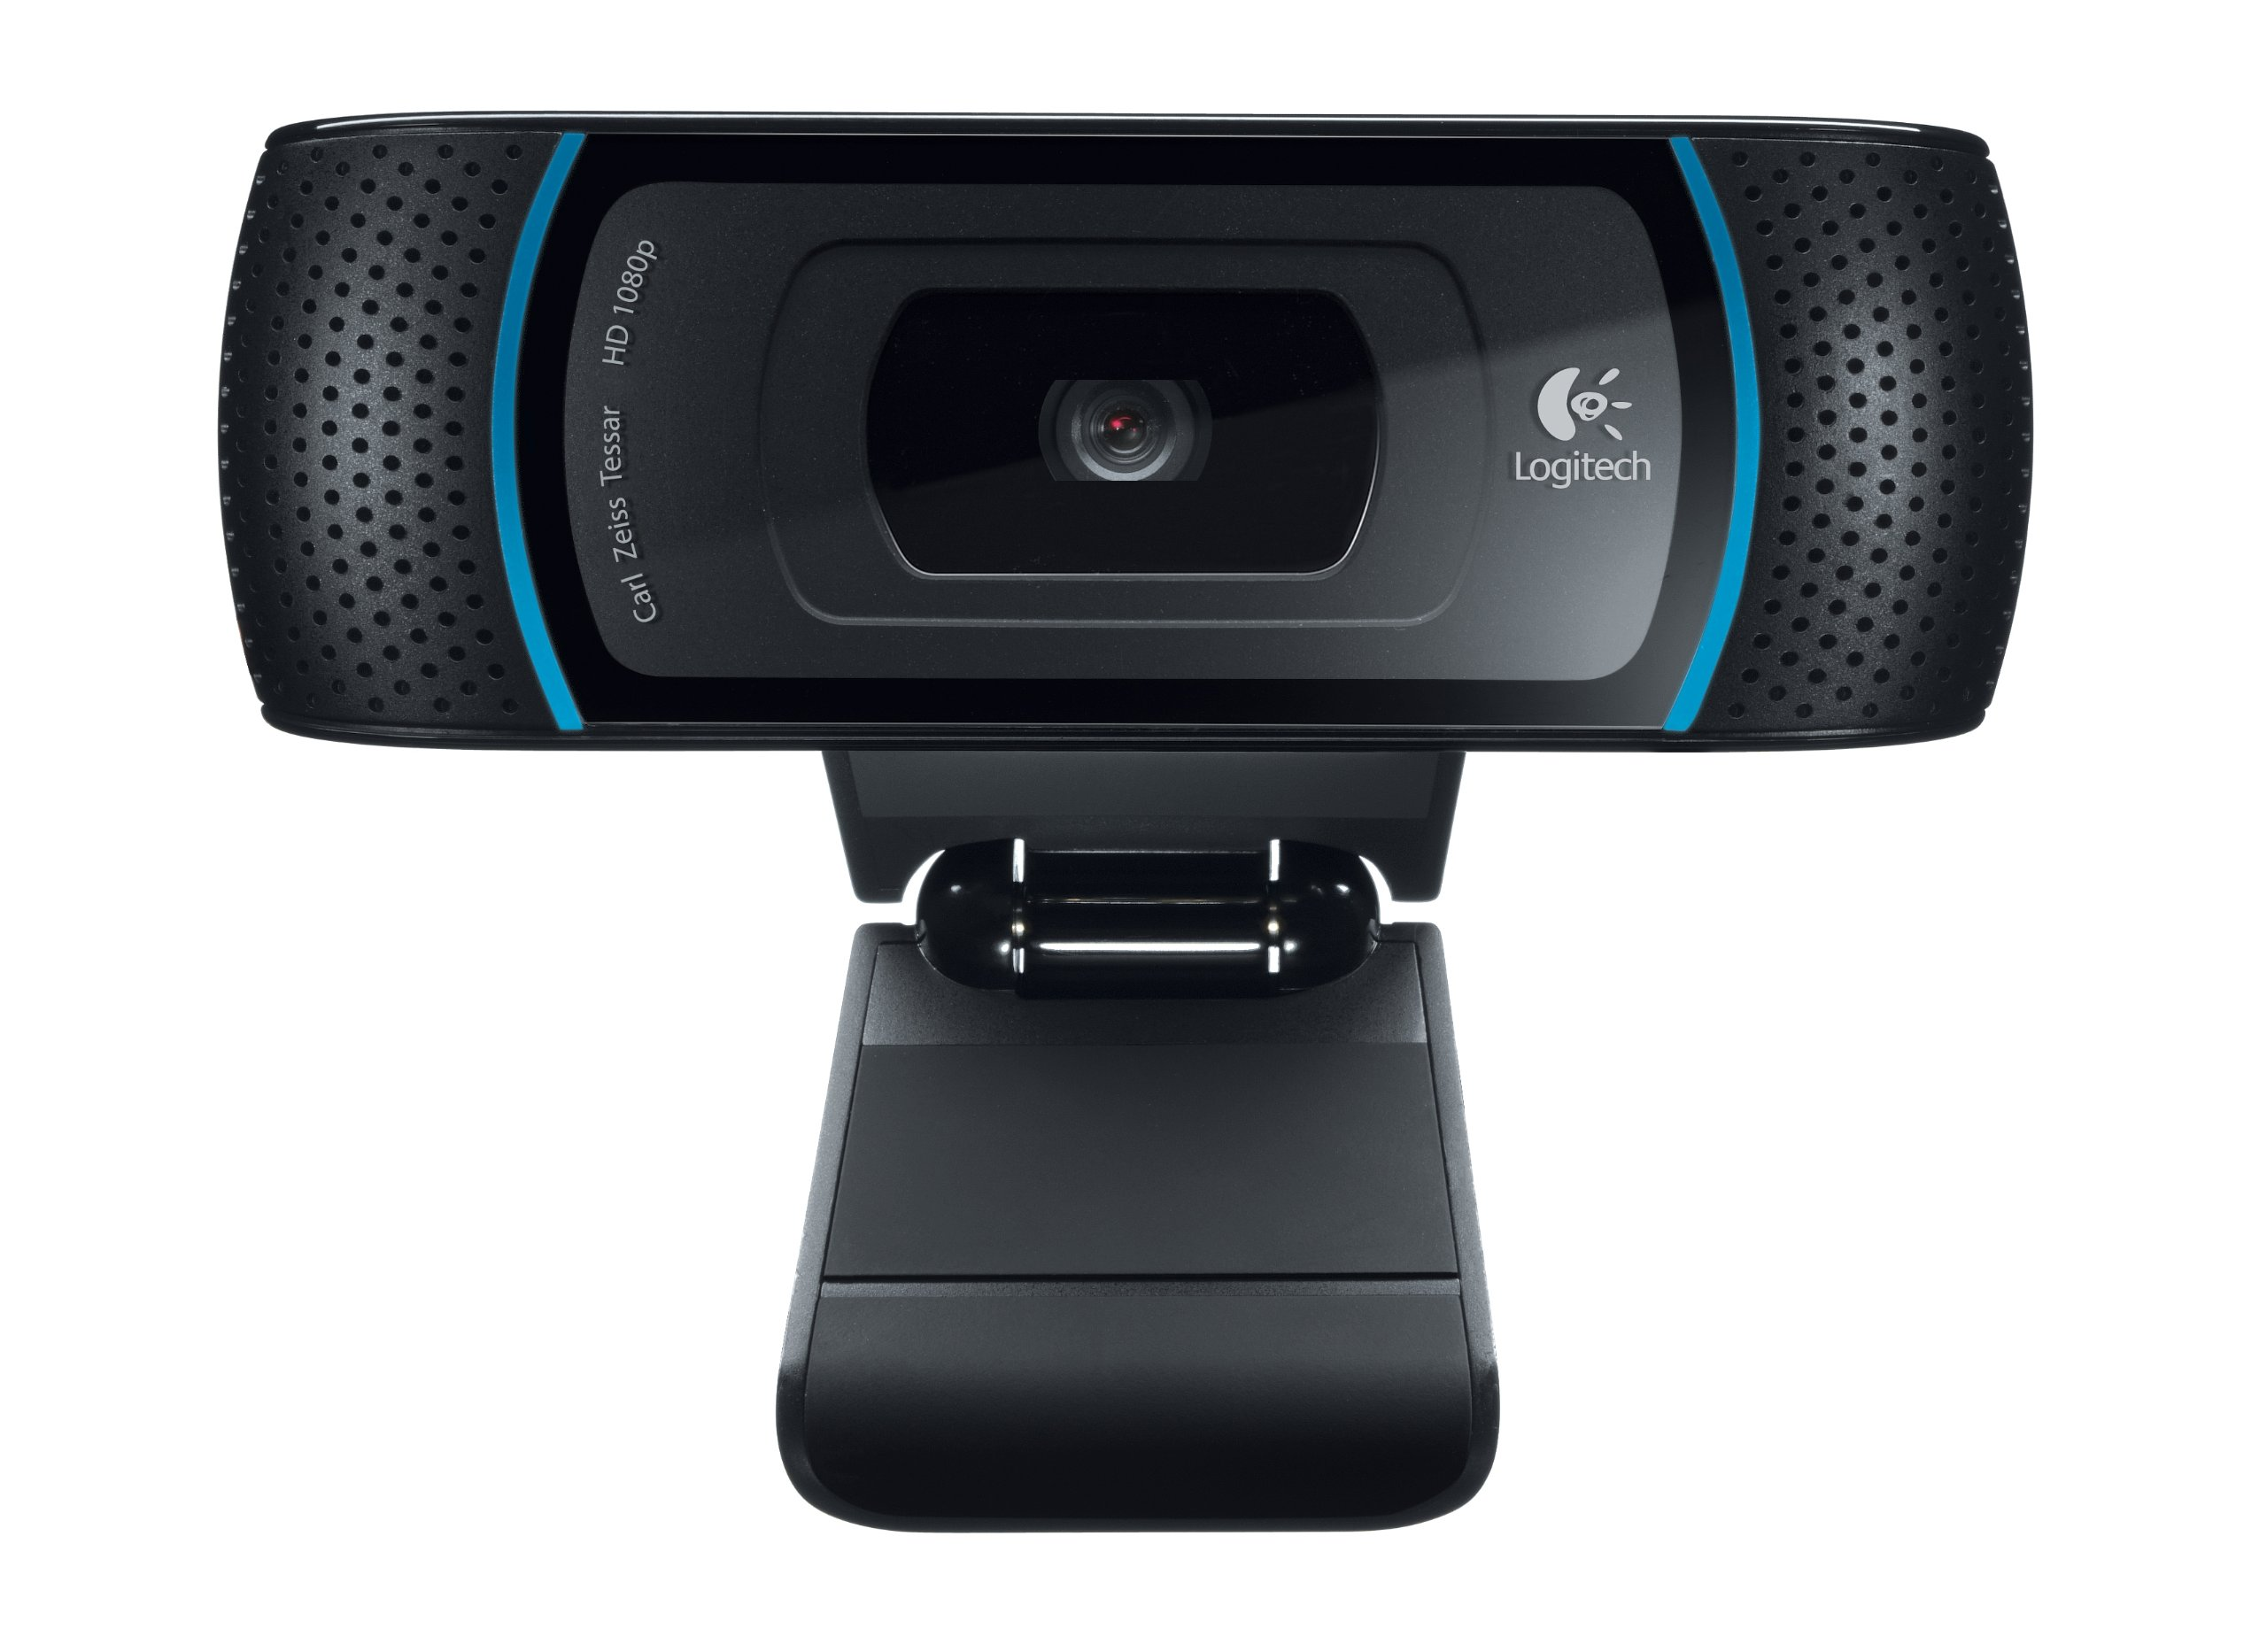 NEW Logitech HD Pro Webcam C910 (Cameras & Frames) by Logitech (Image #3)